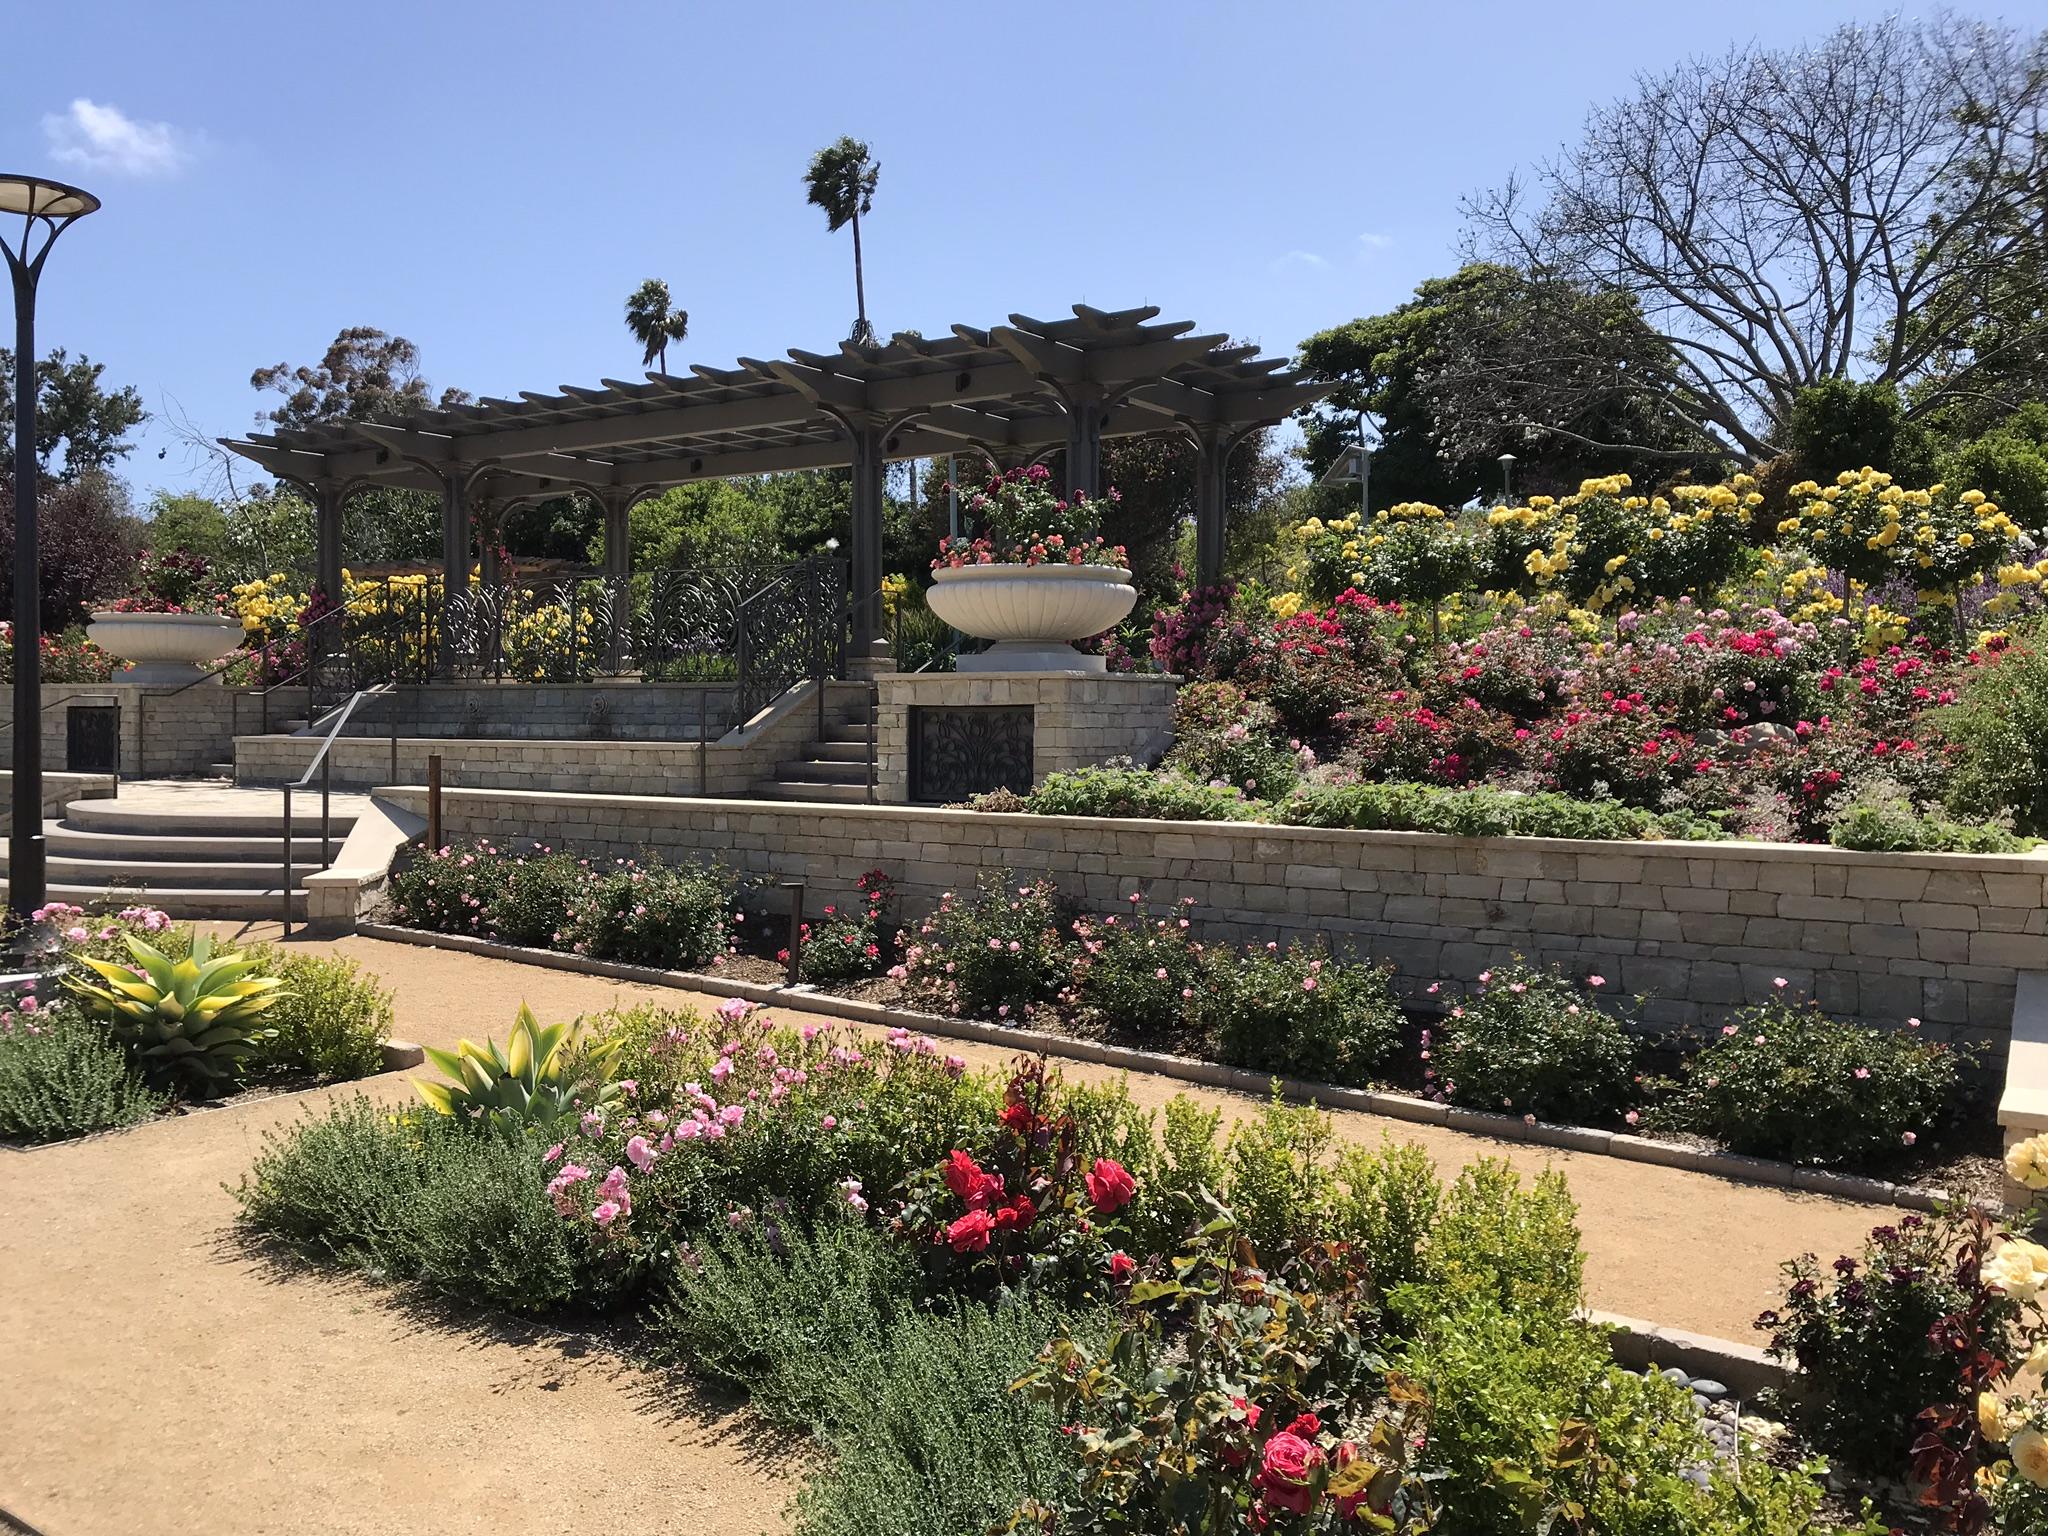 South Coast Botanical Gardens New Rose Garden Designed by Landscape Architect Deborah Richie-Bray